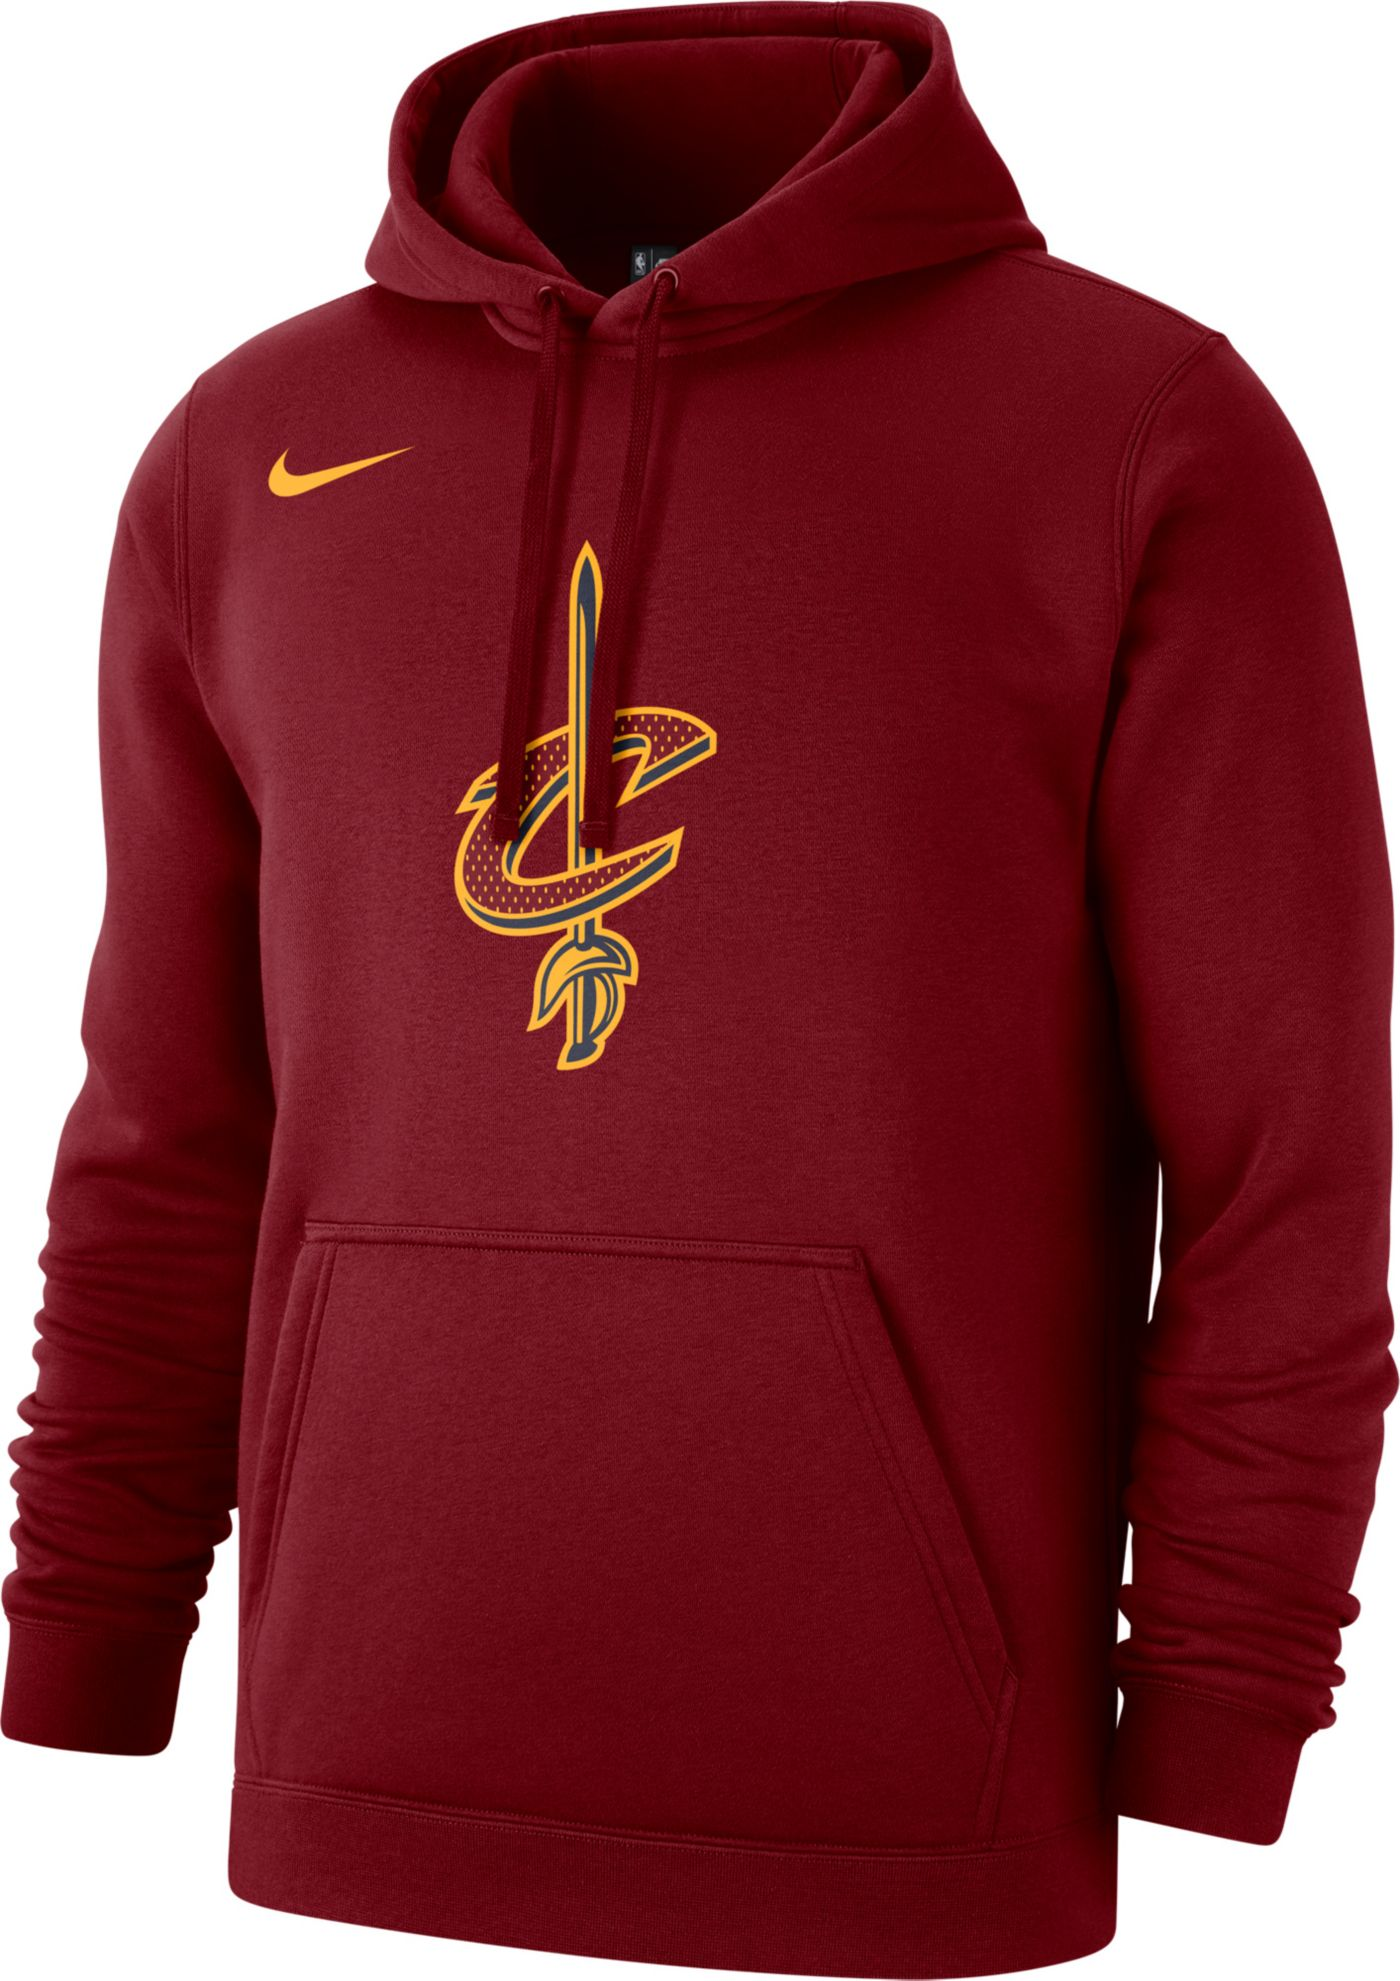 Nike Men's Cleveland Cavaliers Pullover Hoodie